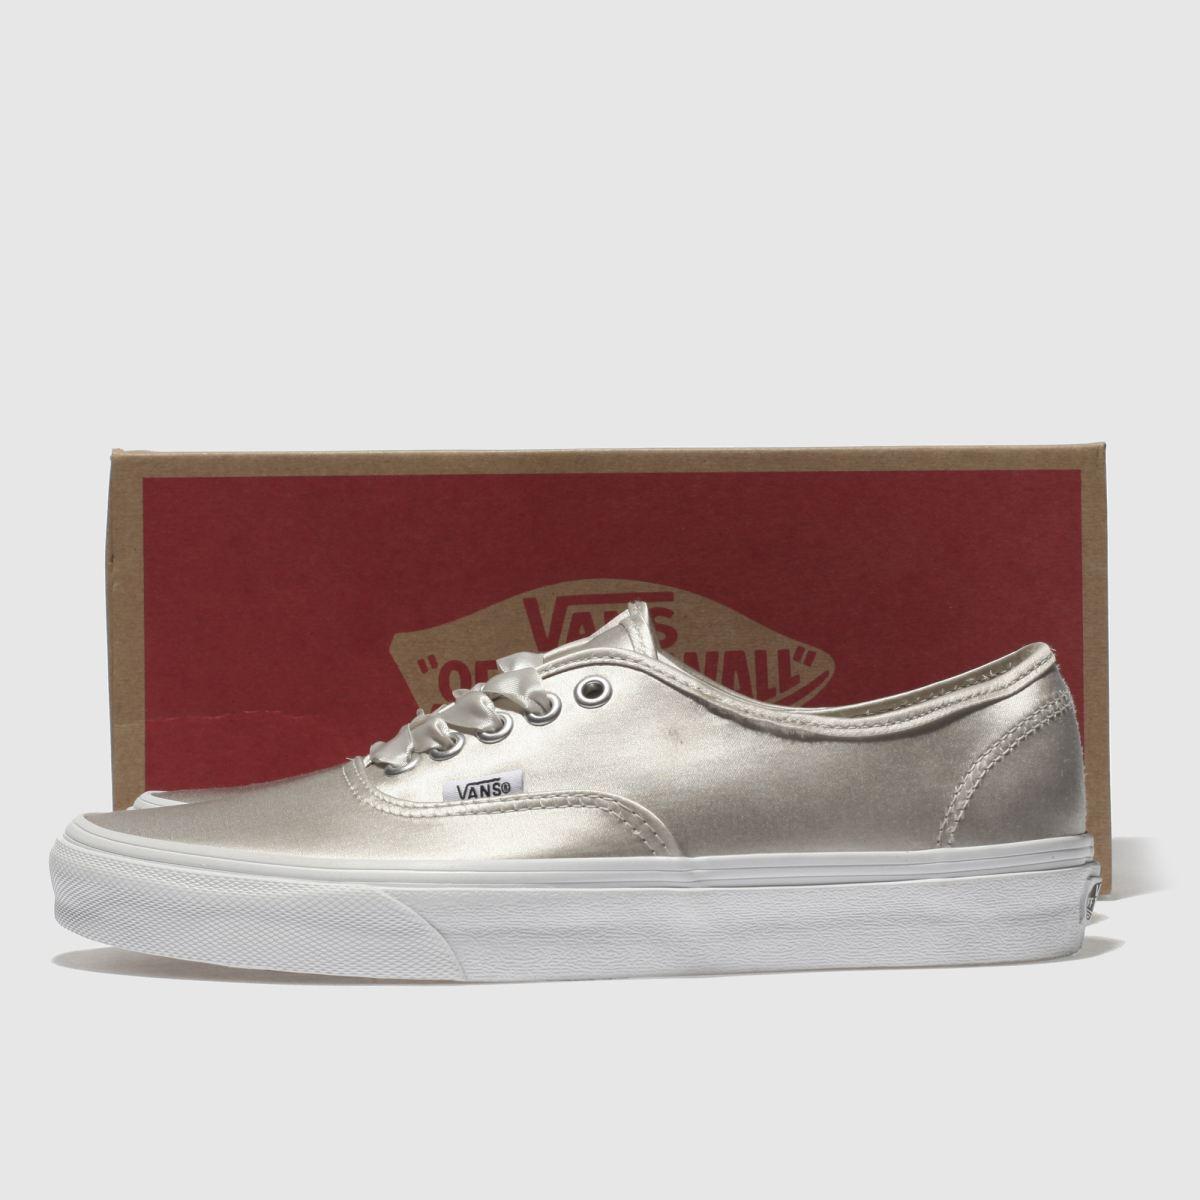 Damen Silber vans Authentic schuh Satin Lux Sneaker | schuh Authentic Gute Qualität beliebte Schuhe 7f3a90